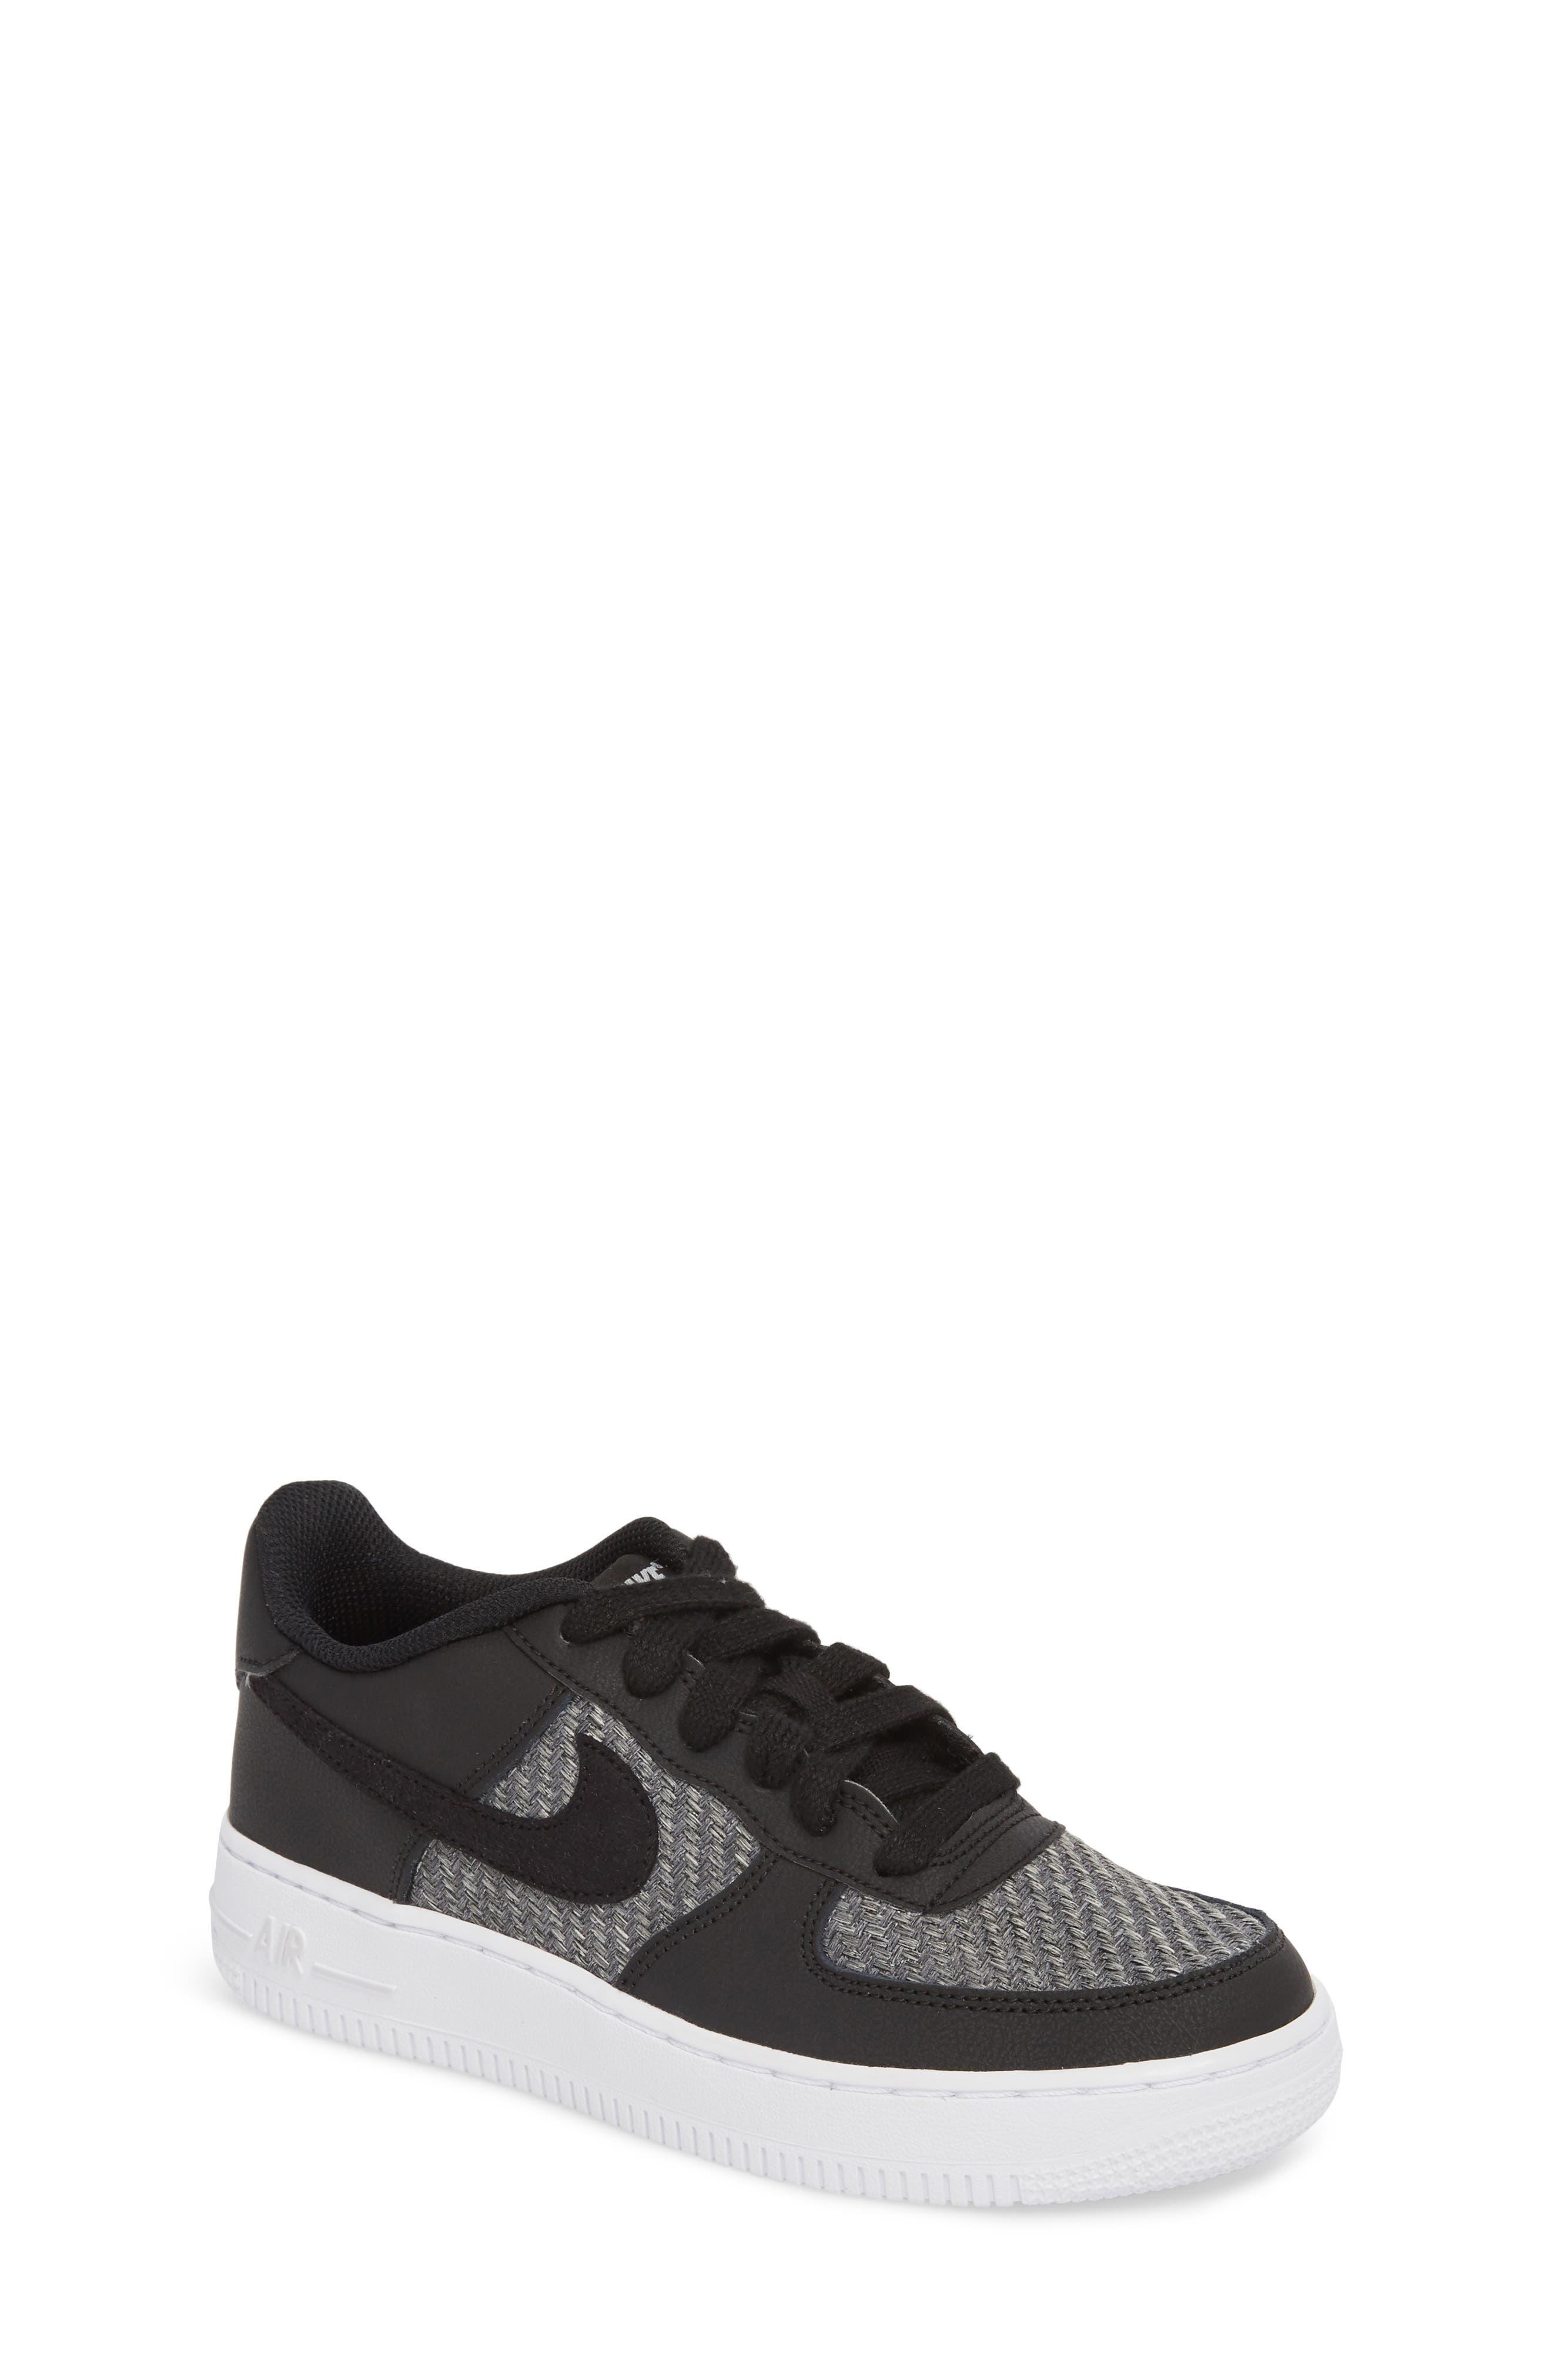 Nike Air Force 1 LV8 Sneaker (Big Kid)